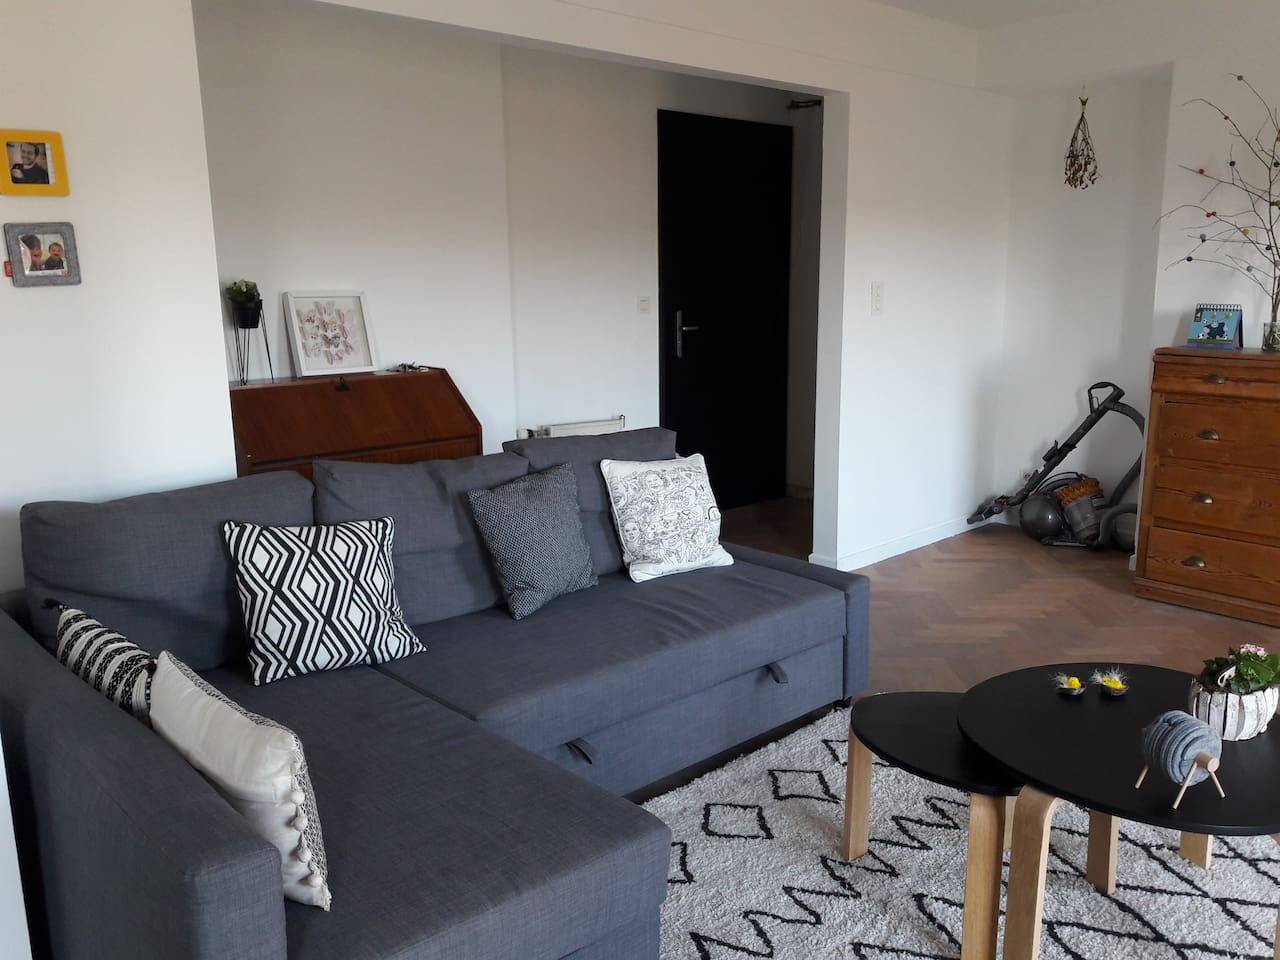 Appartement calme - Grande terrasse avec vue